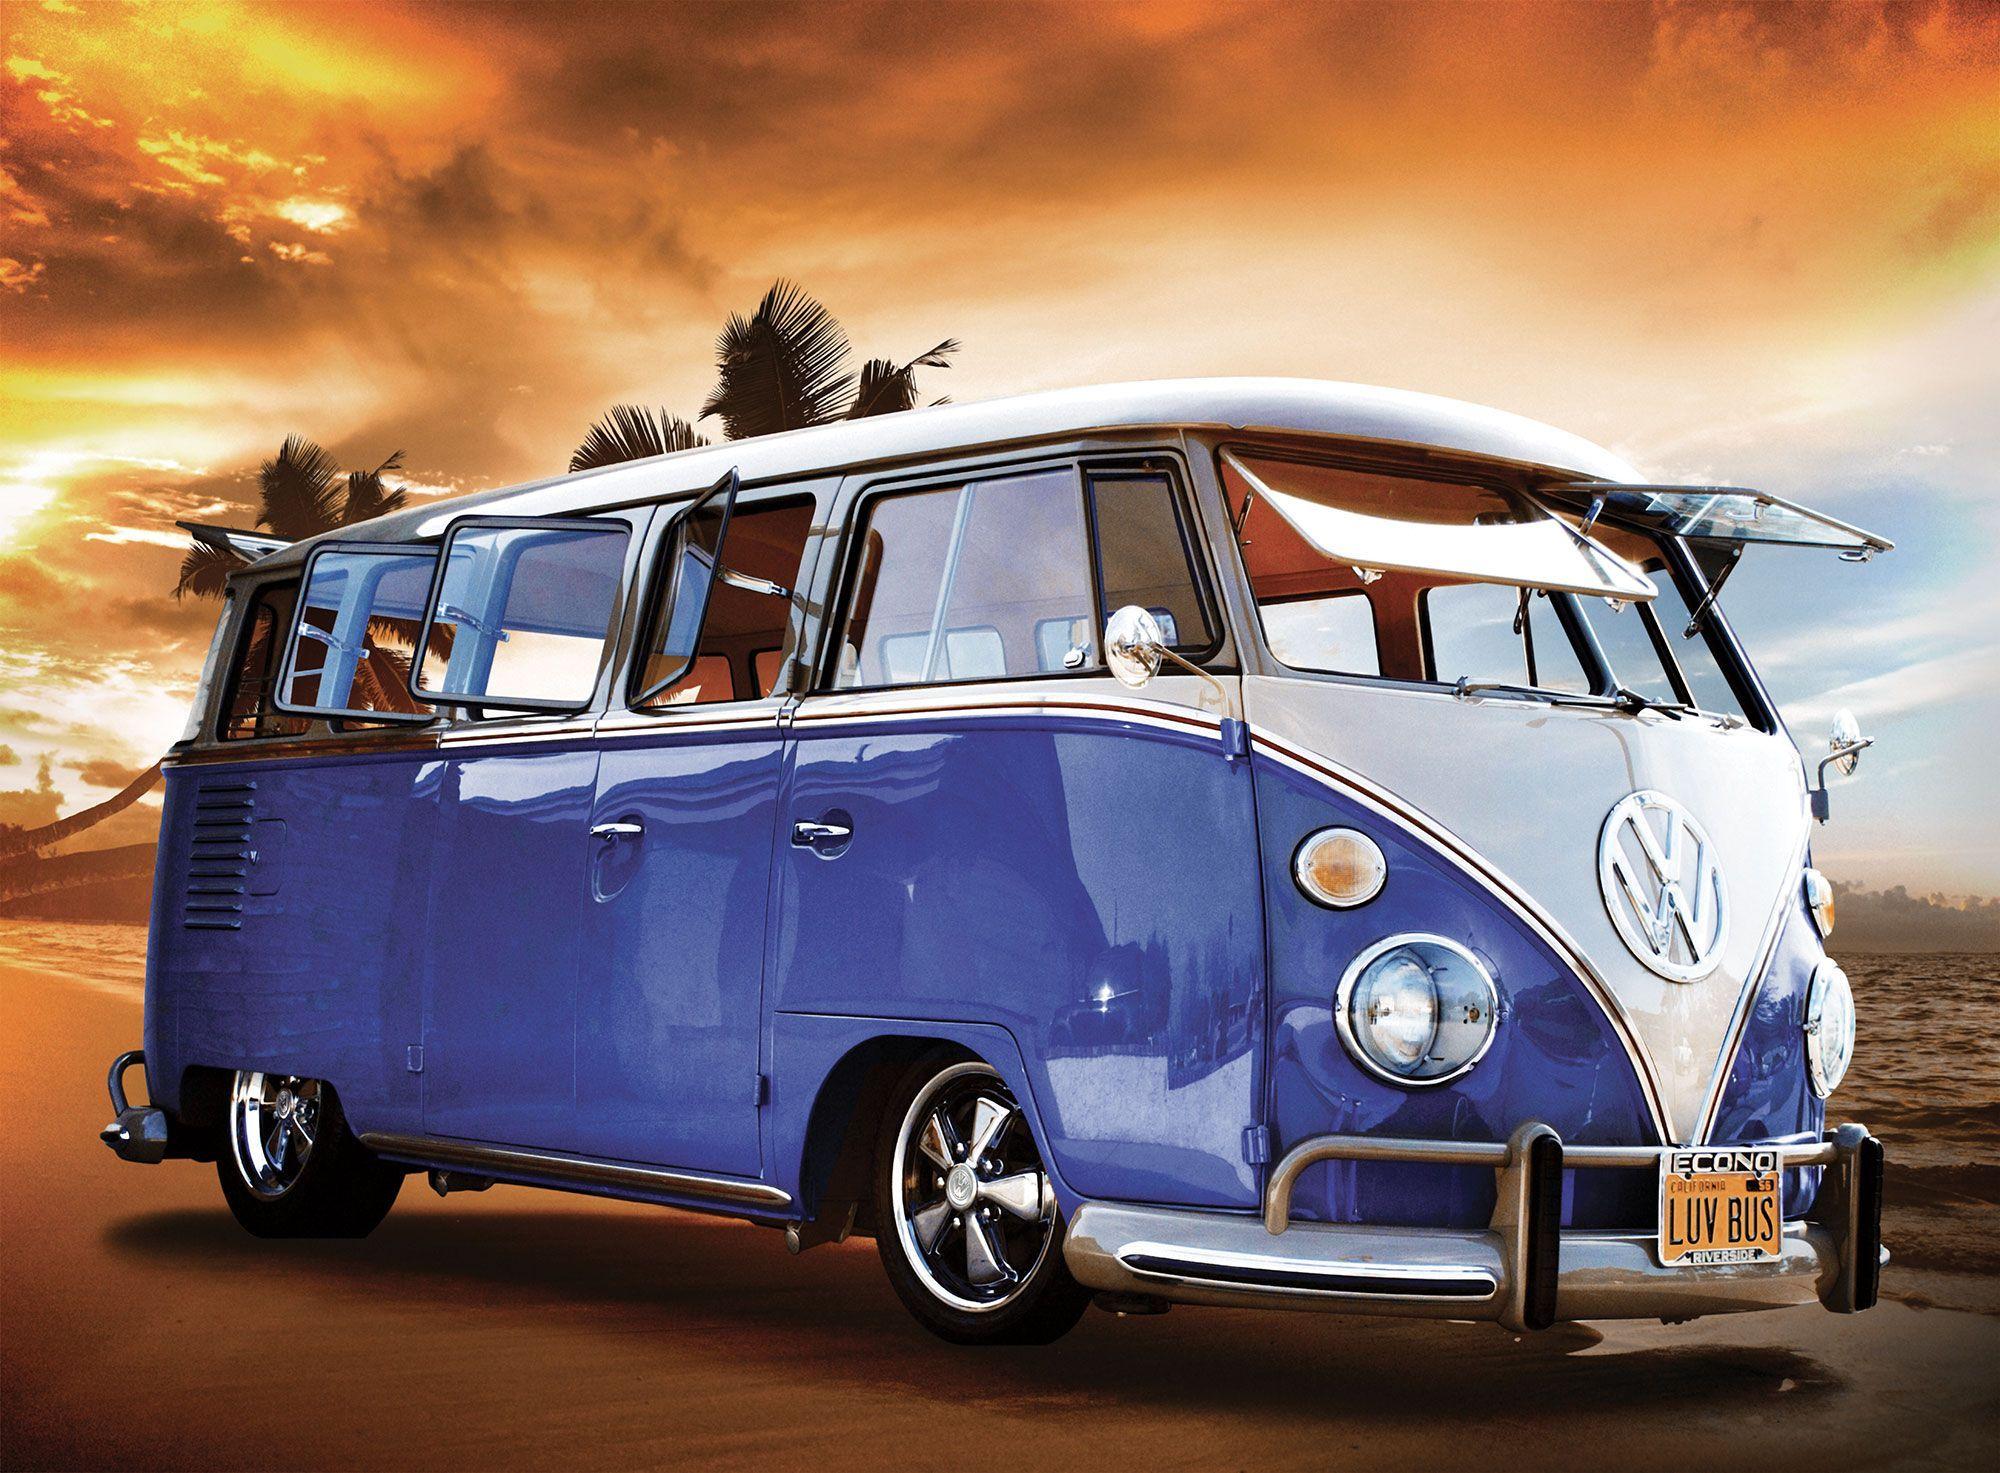 1wall Giant Blue Vw Wallpaper Departments Diy At B Amp Q Vintage Vw Van Volkswagen Minibus Campervan Wallpaper